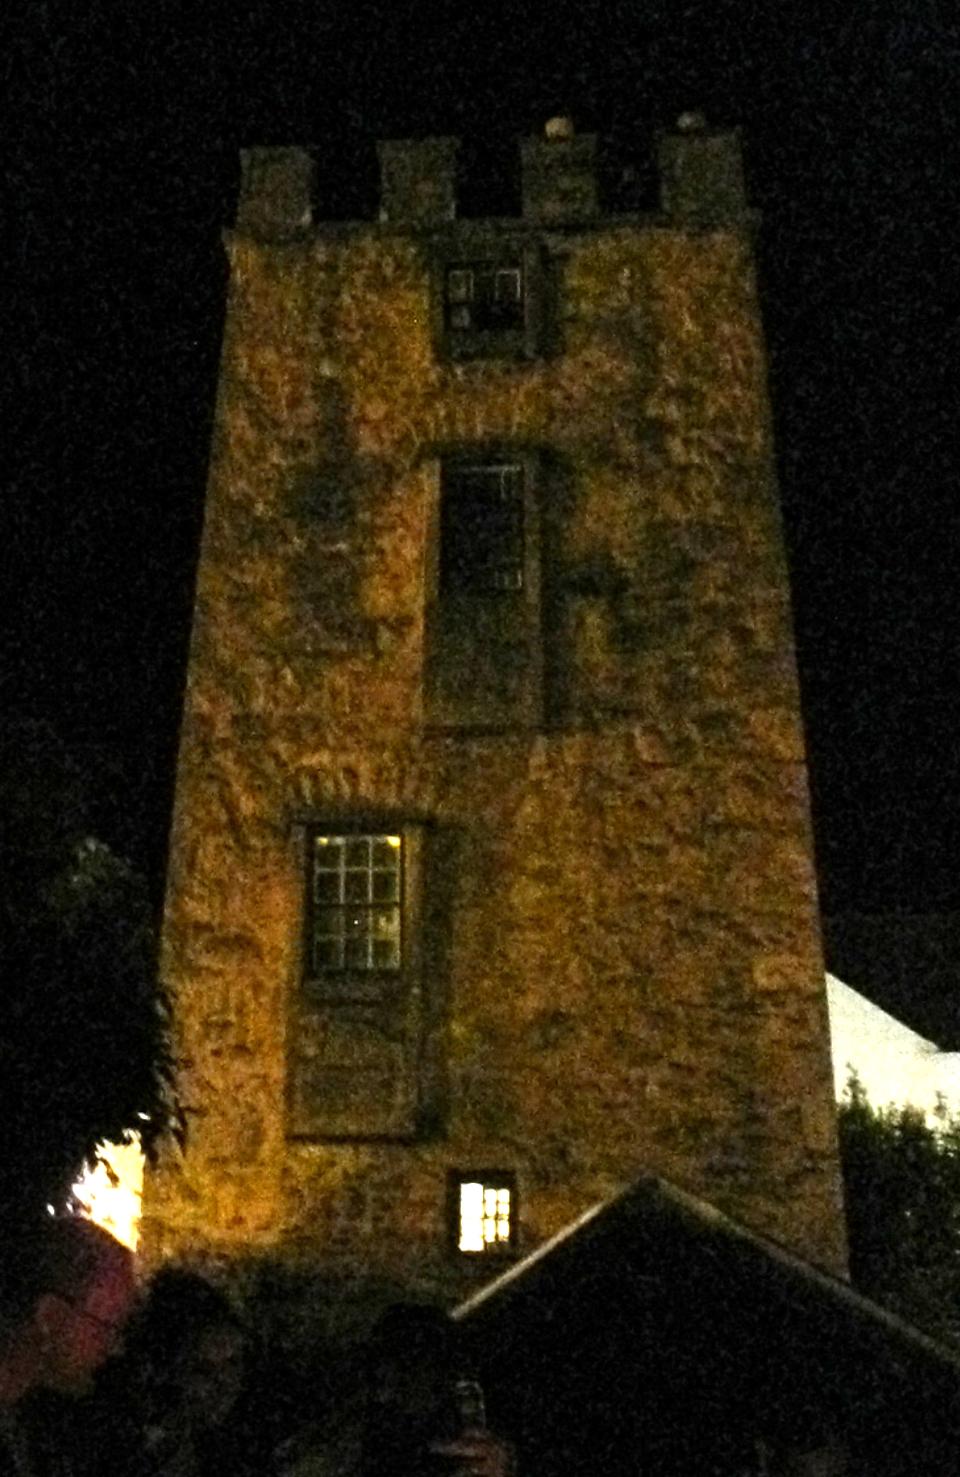 The Curfew Tower by bonfire light